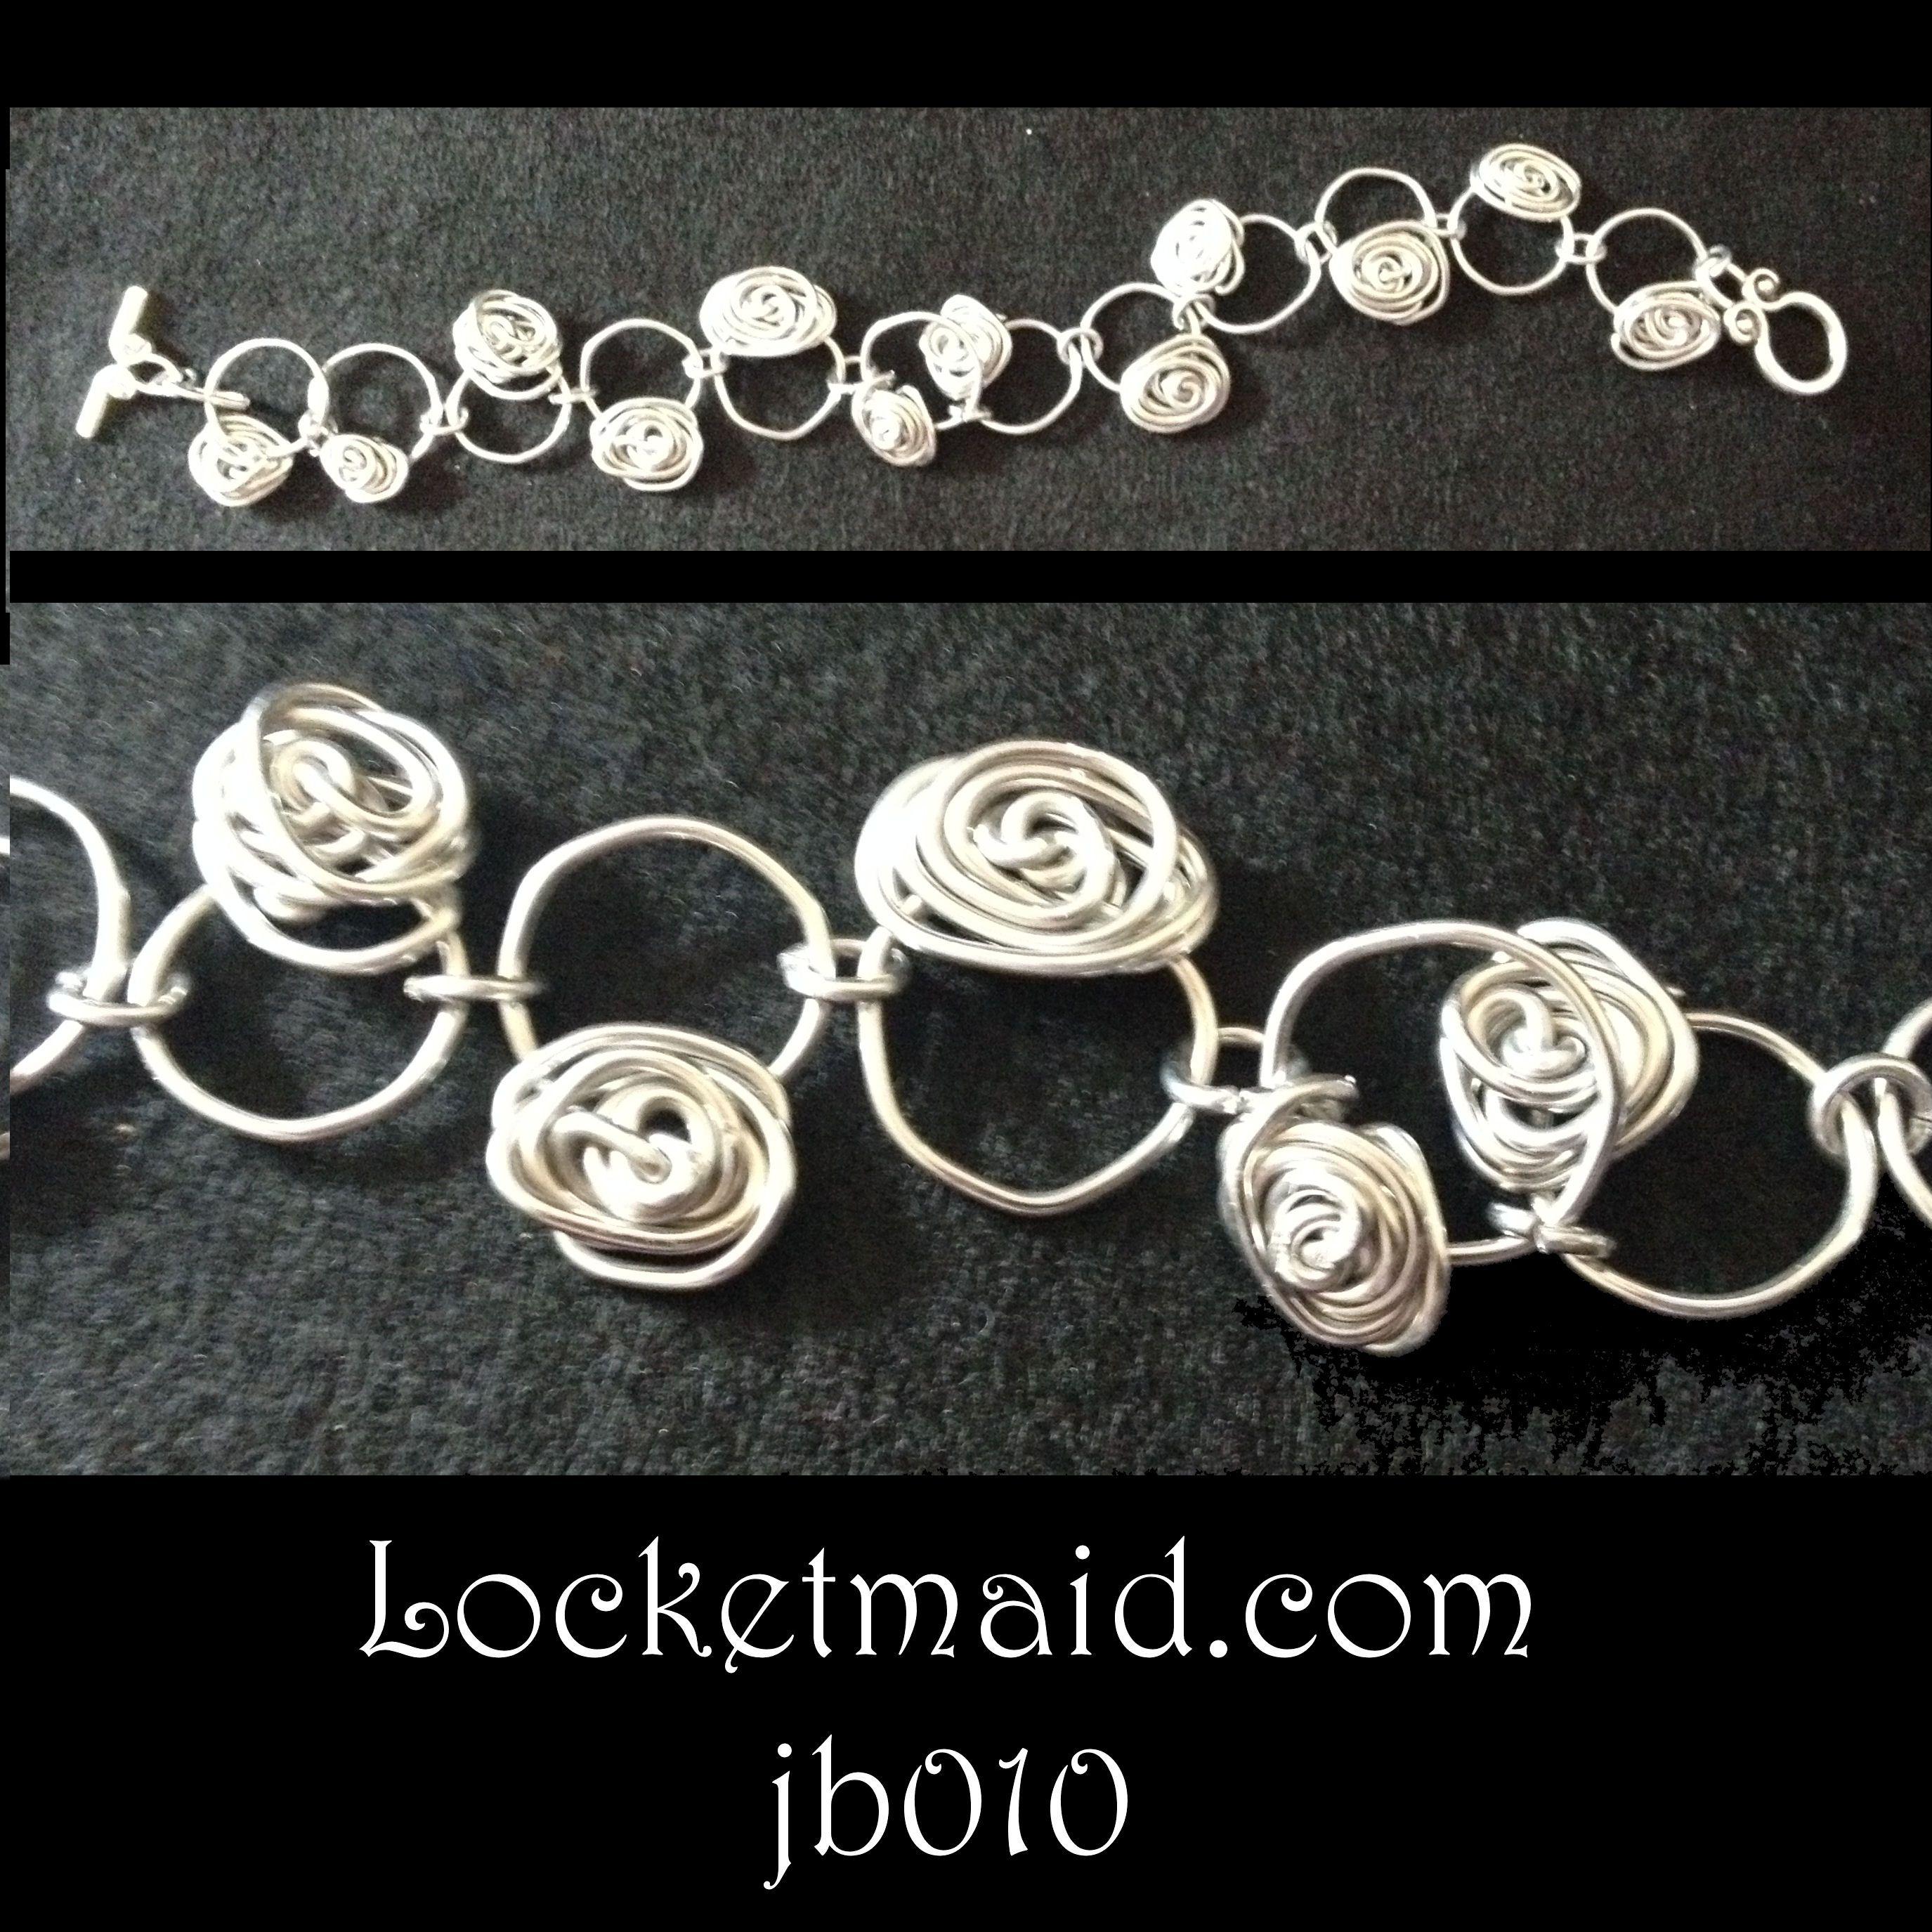 Bracelet - aluminium jewellery wire with flower detail £6 on www.locketmaid.com